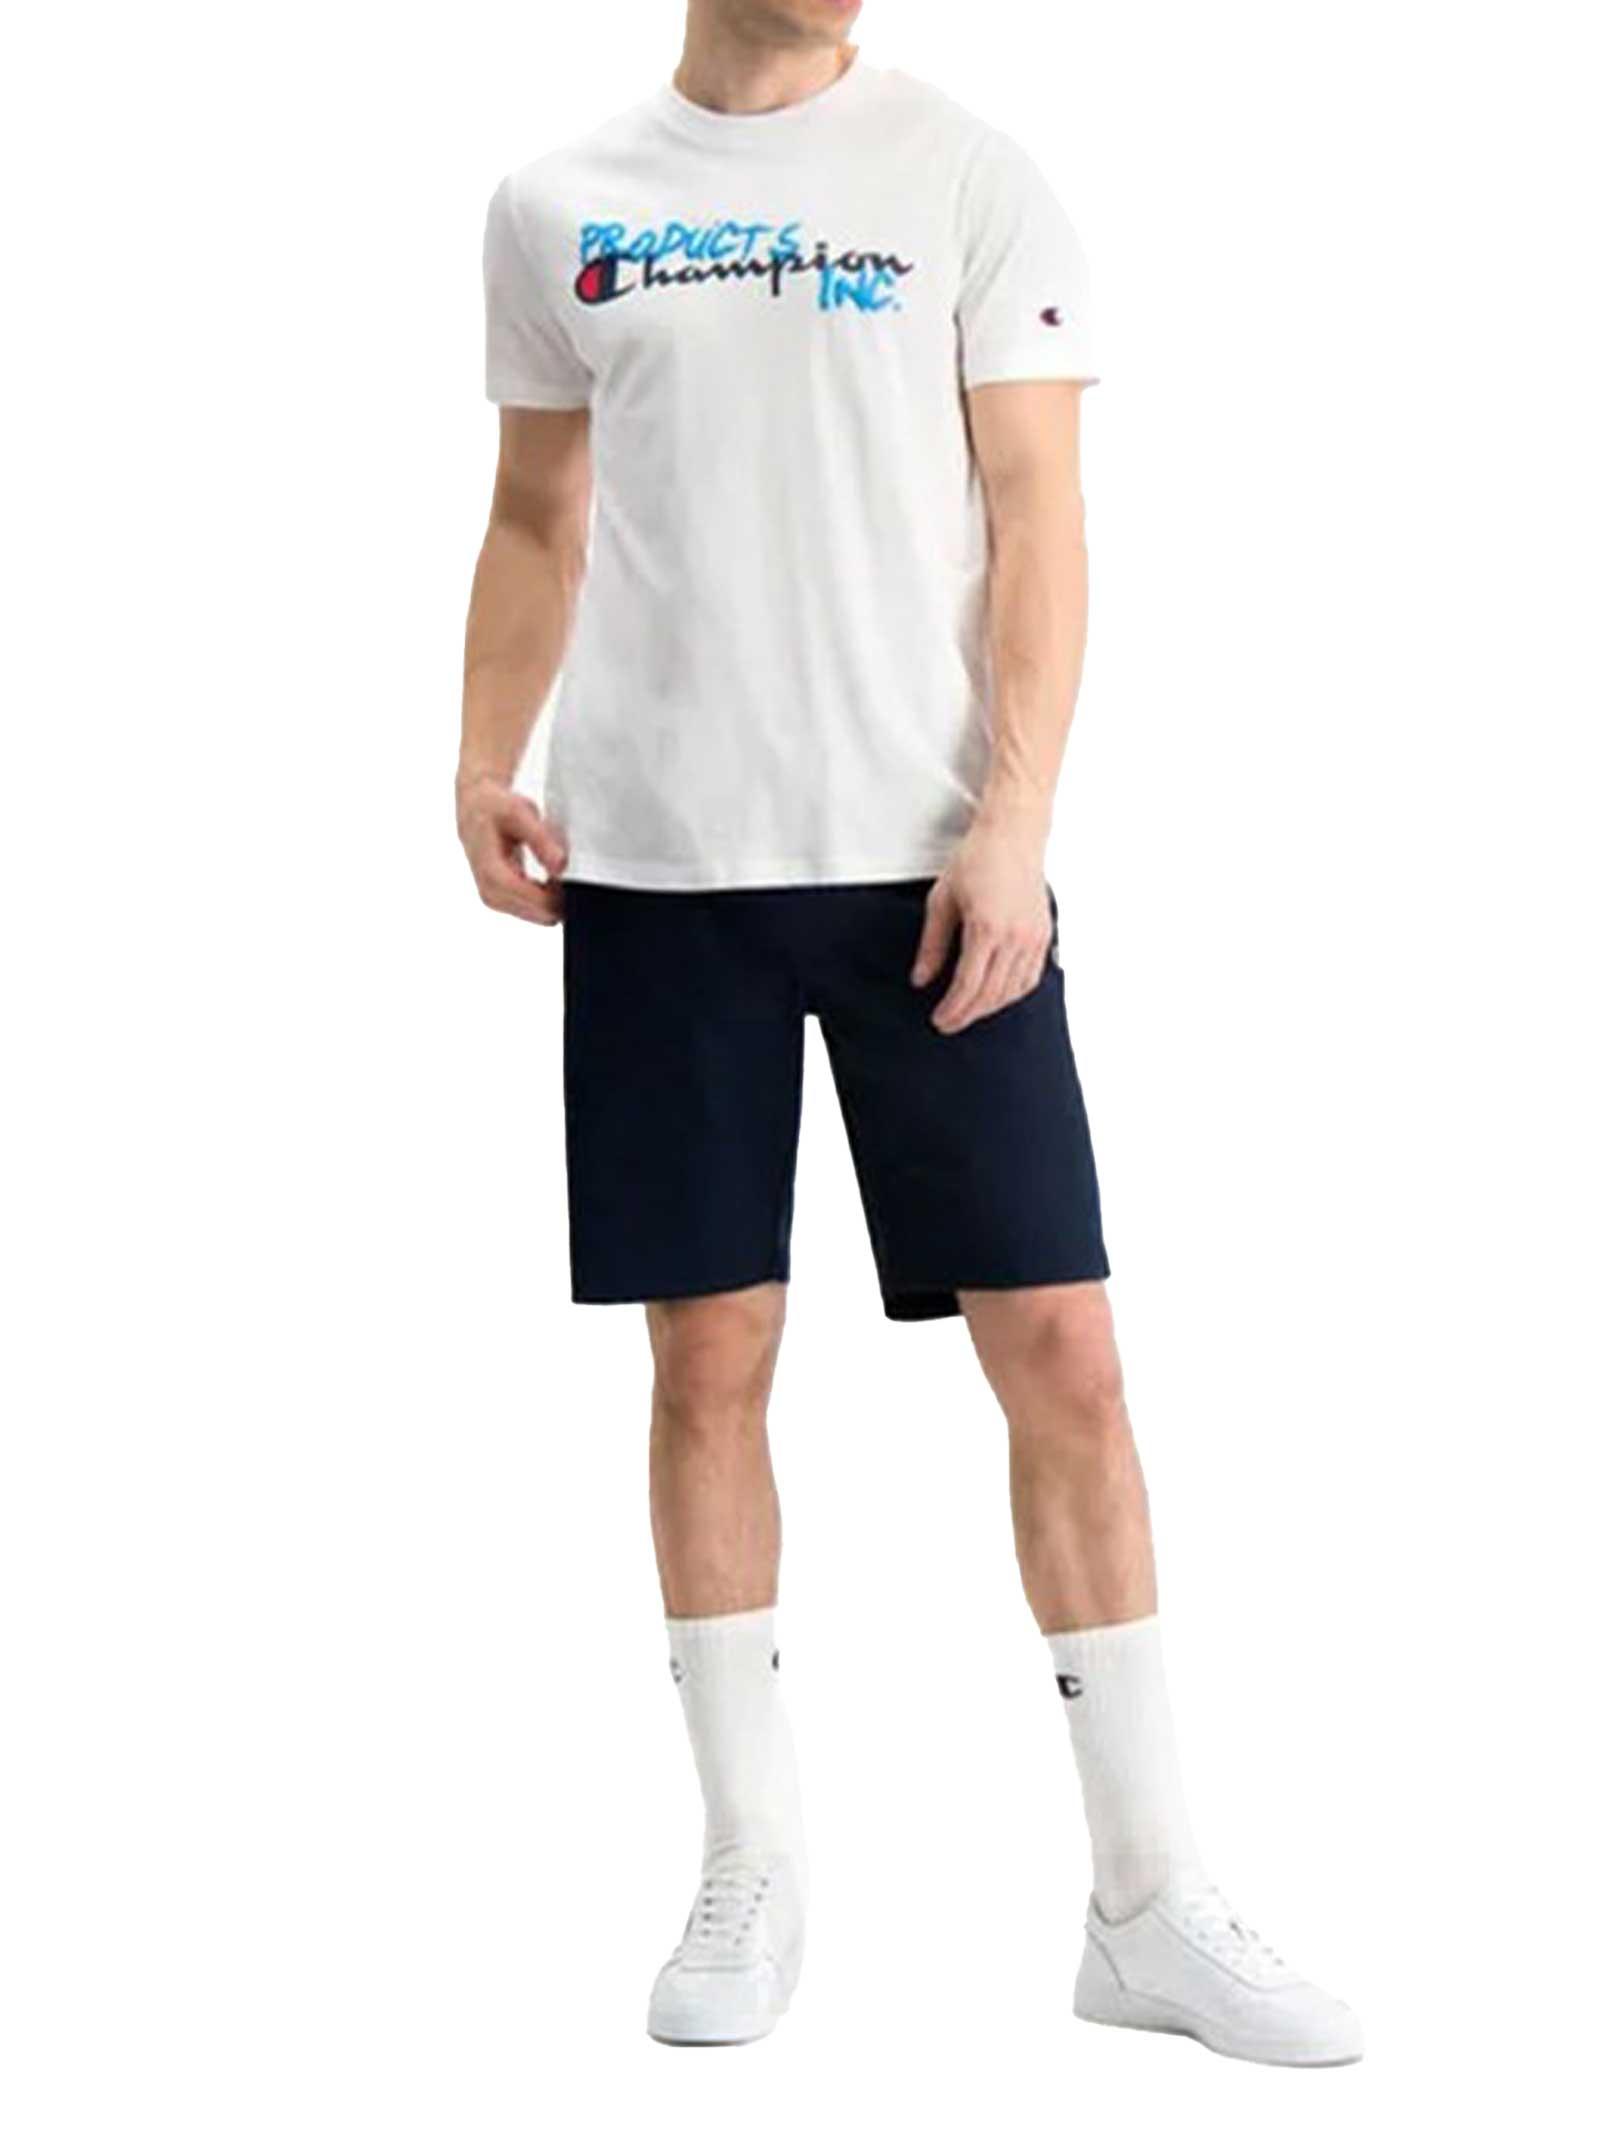 T-SHIRT UOMO CHAMPION | T-shirt | 214344WHT